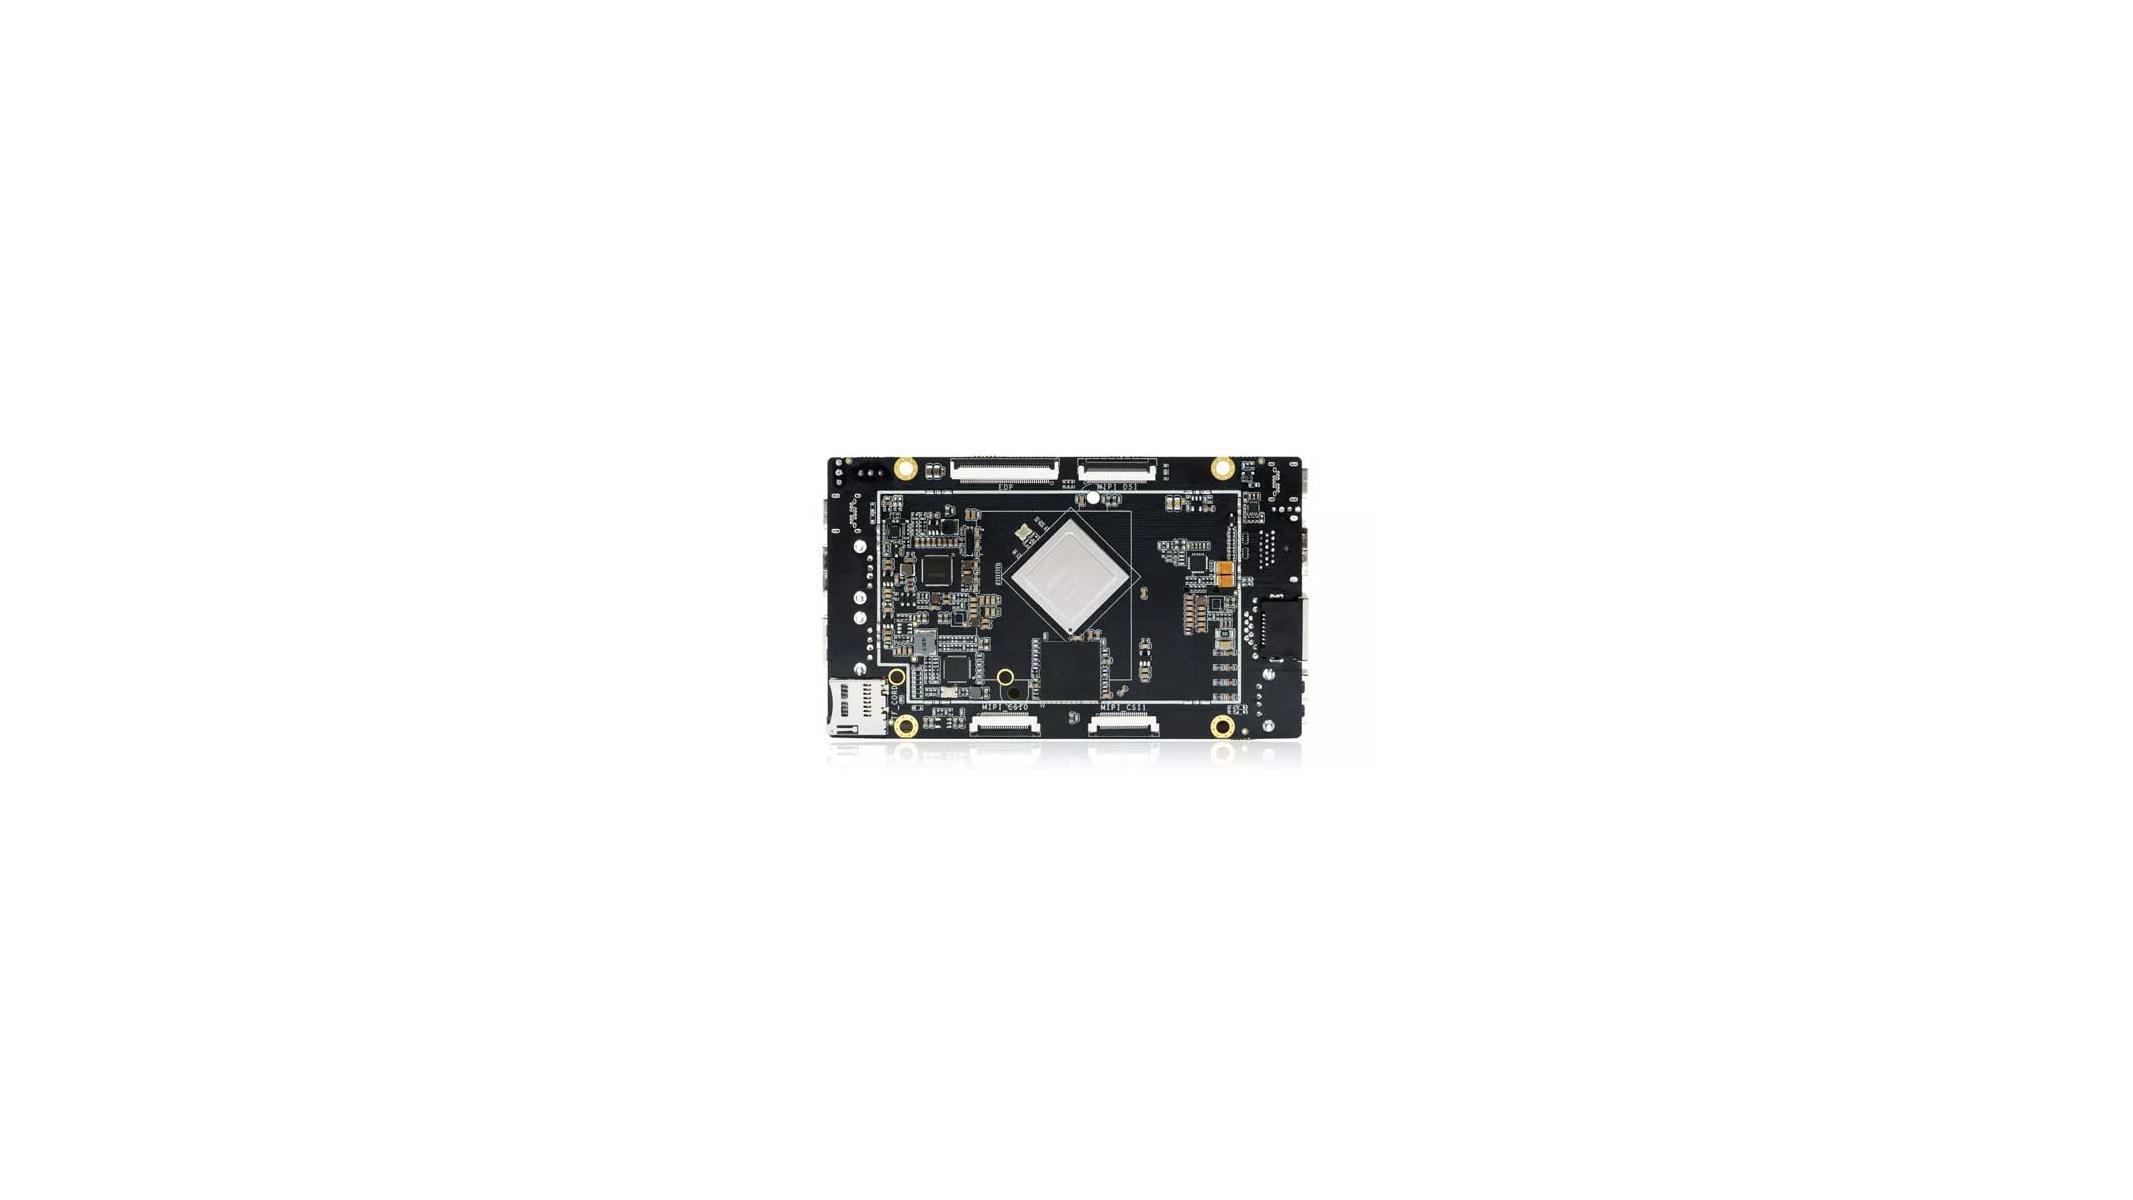 Renegade Elite Mini PC Board Emerges As An Upscale Raspberry Pi 3